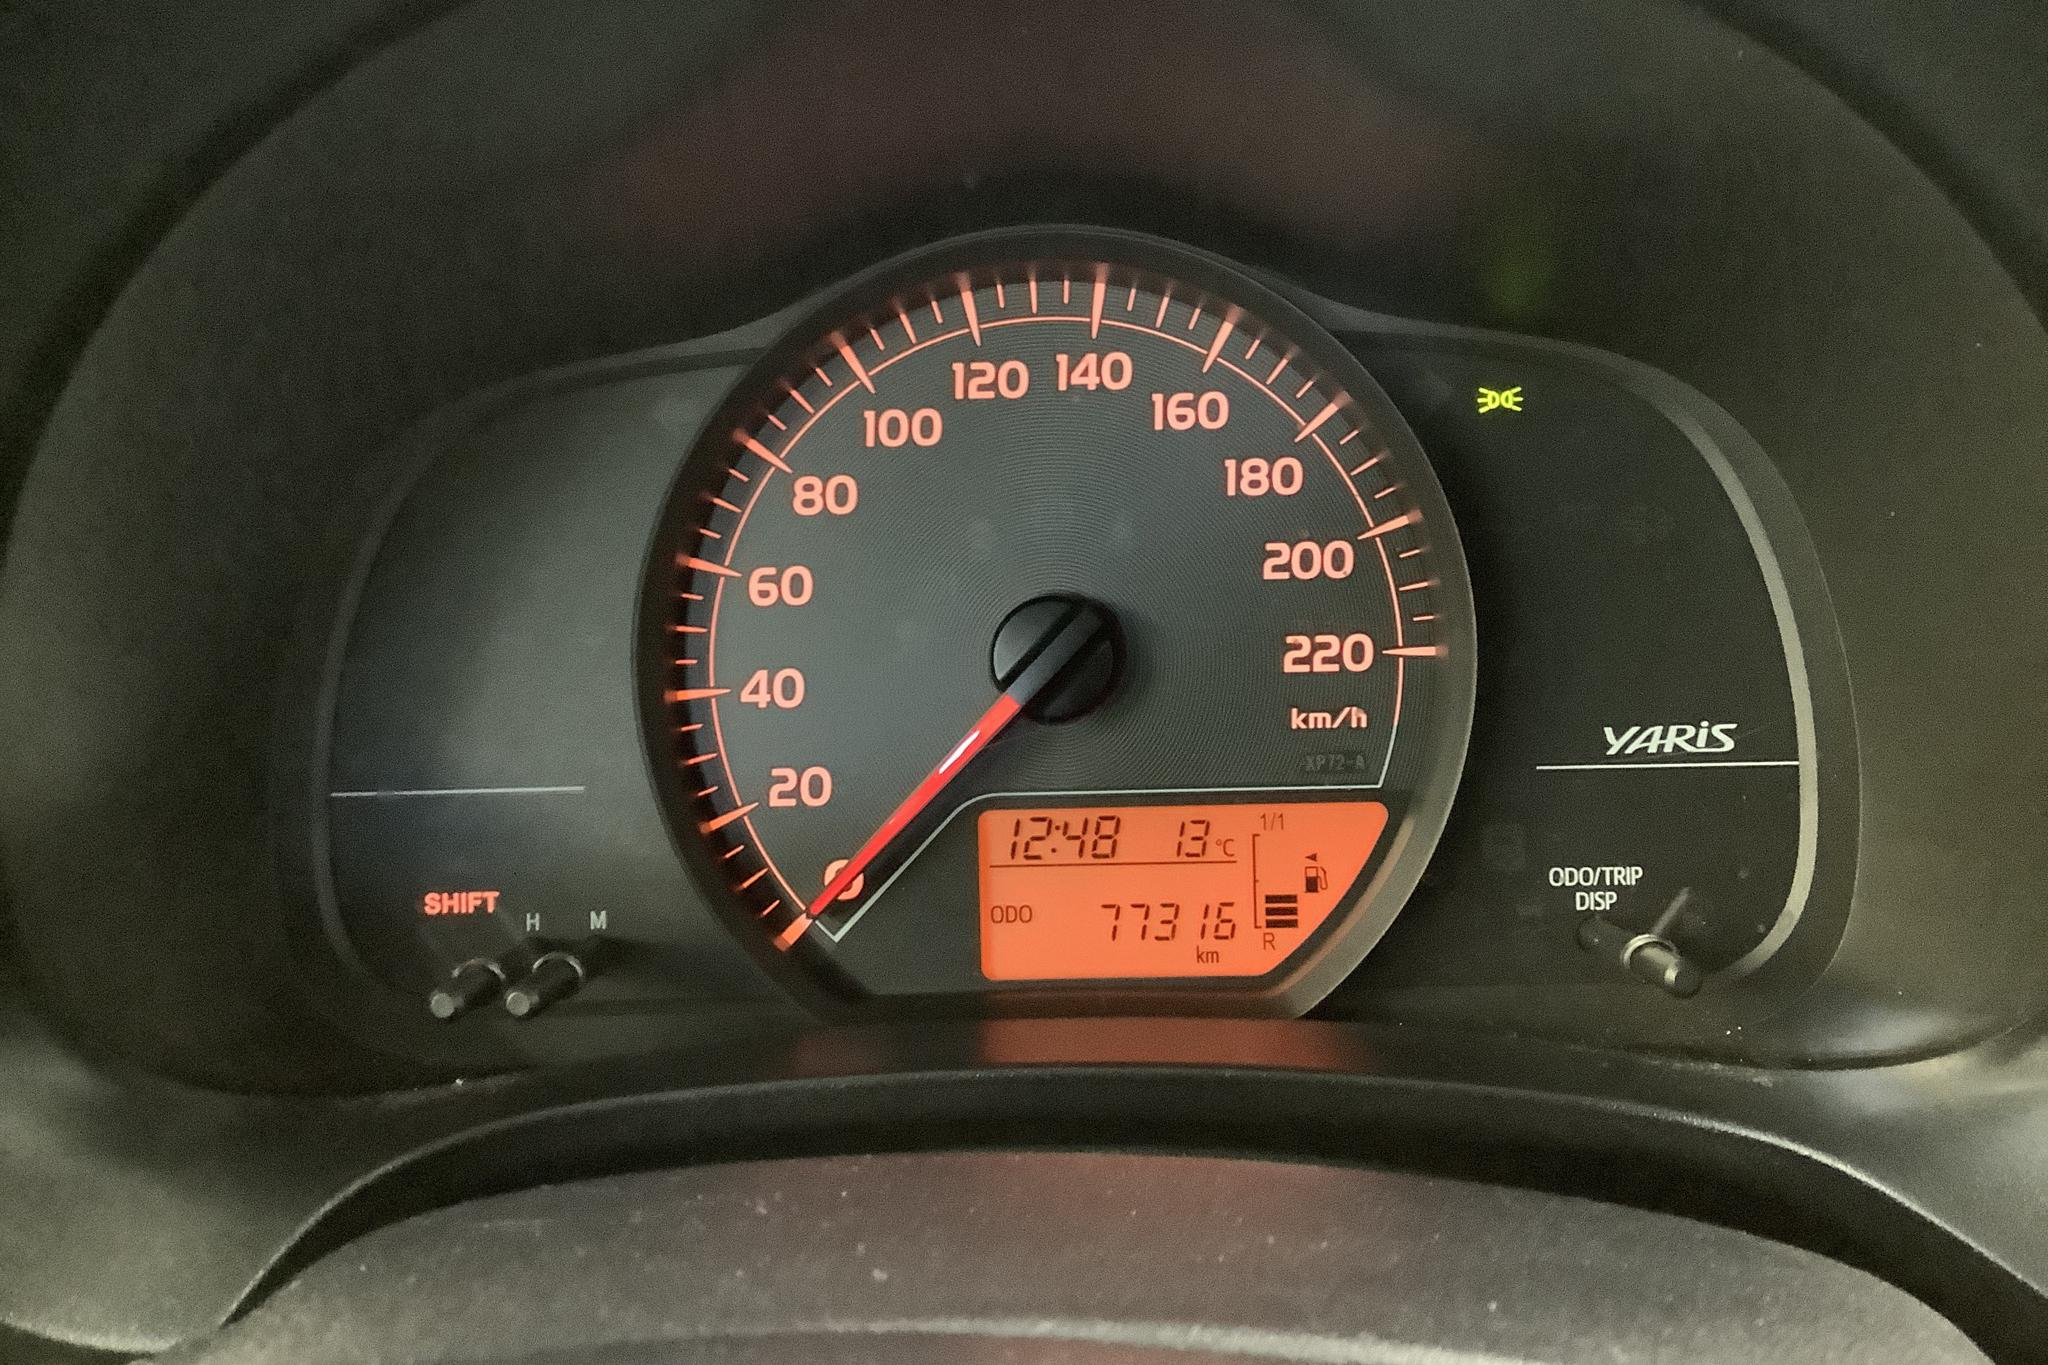 Toyota Yaris 1.4 D-4D 5dr (90hk) - 7 731 mil - Manuell - Dark Grey - 2013